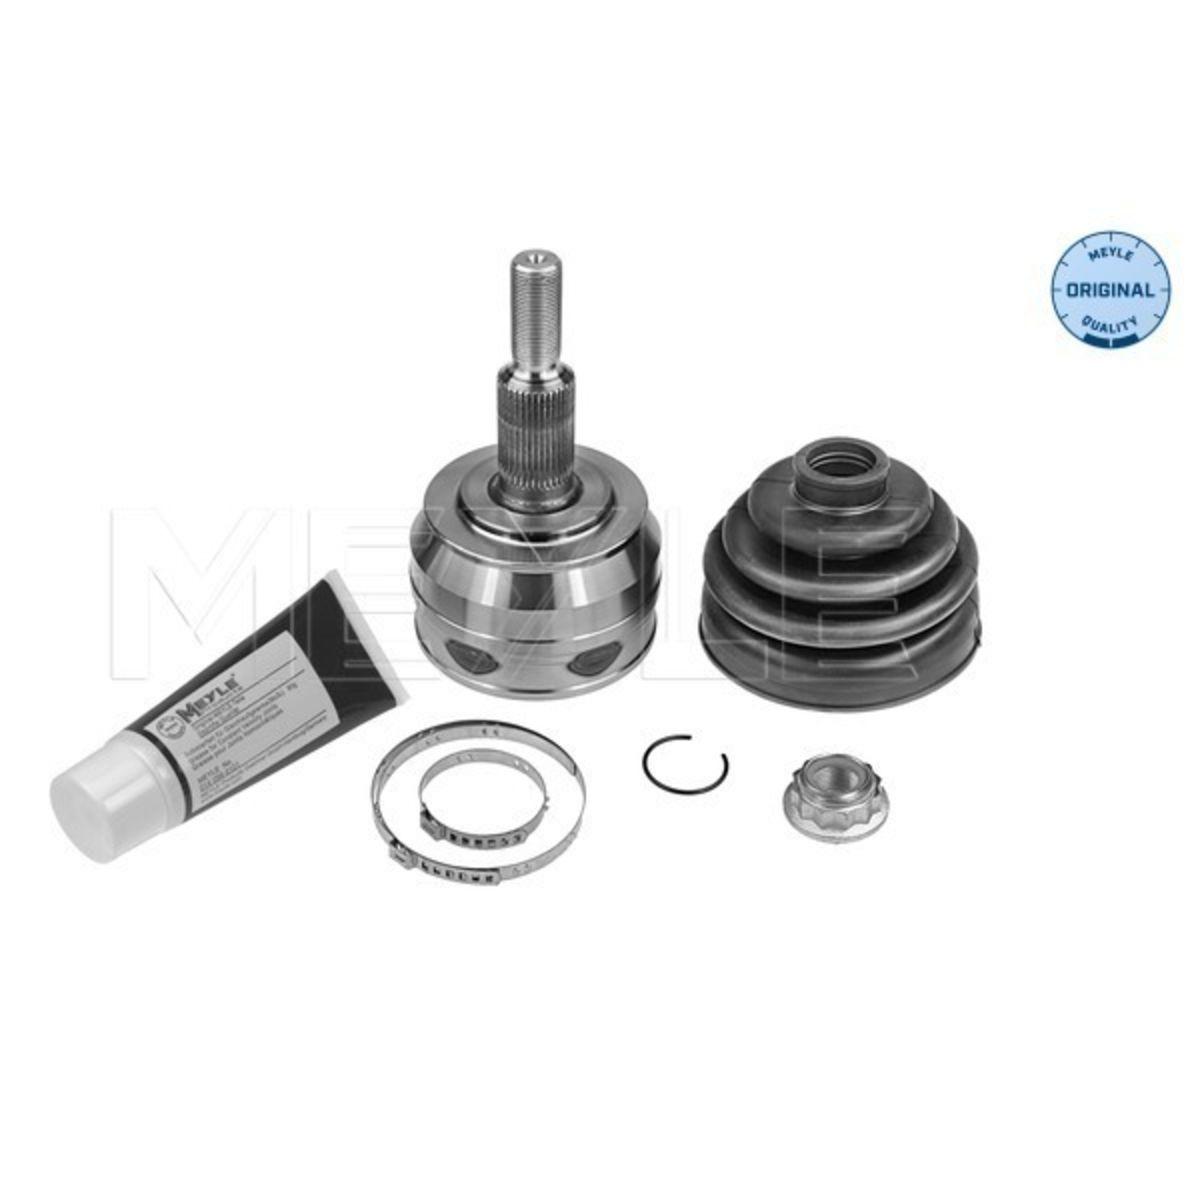 Faltenbalgsatz Antriebswelle MEYLE-ORIGINAL Quality radseitig Meyle 100 498 90